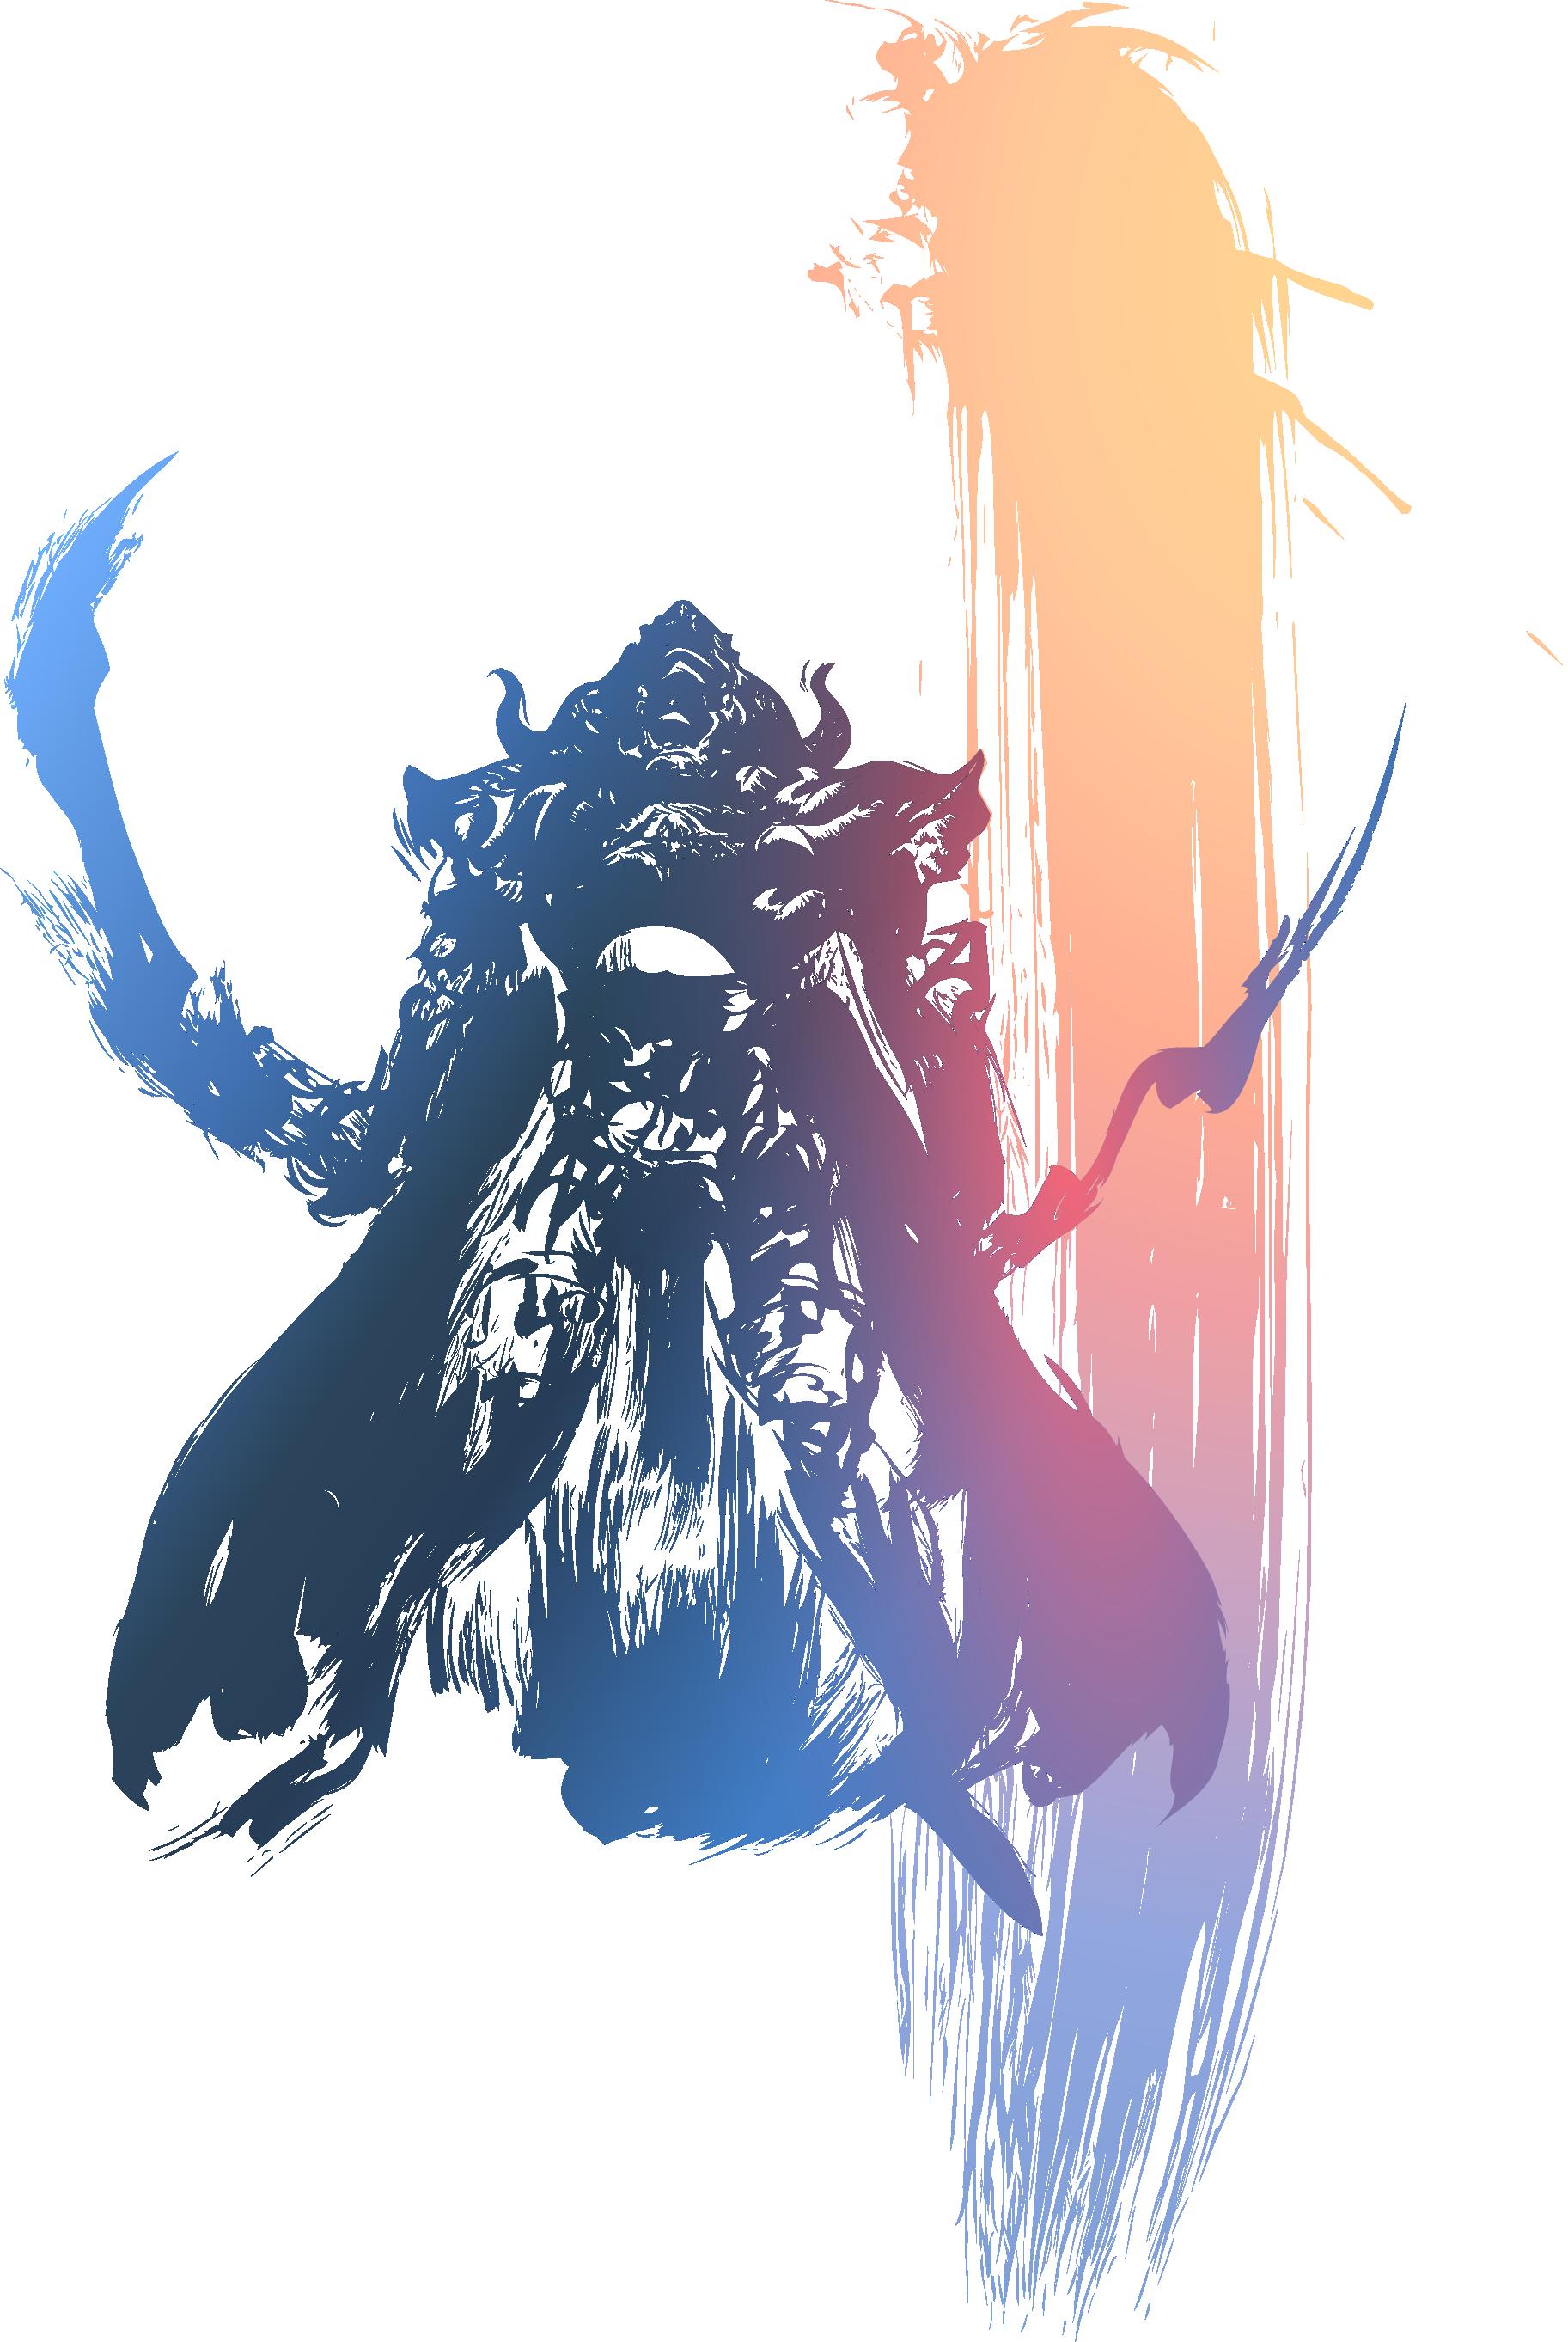 Final fantasy xii logo png - photo#1